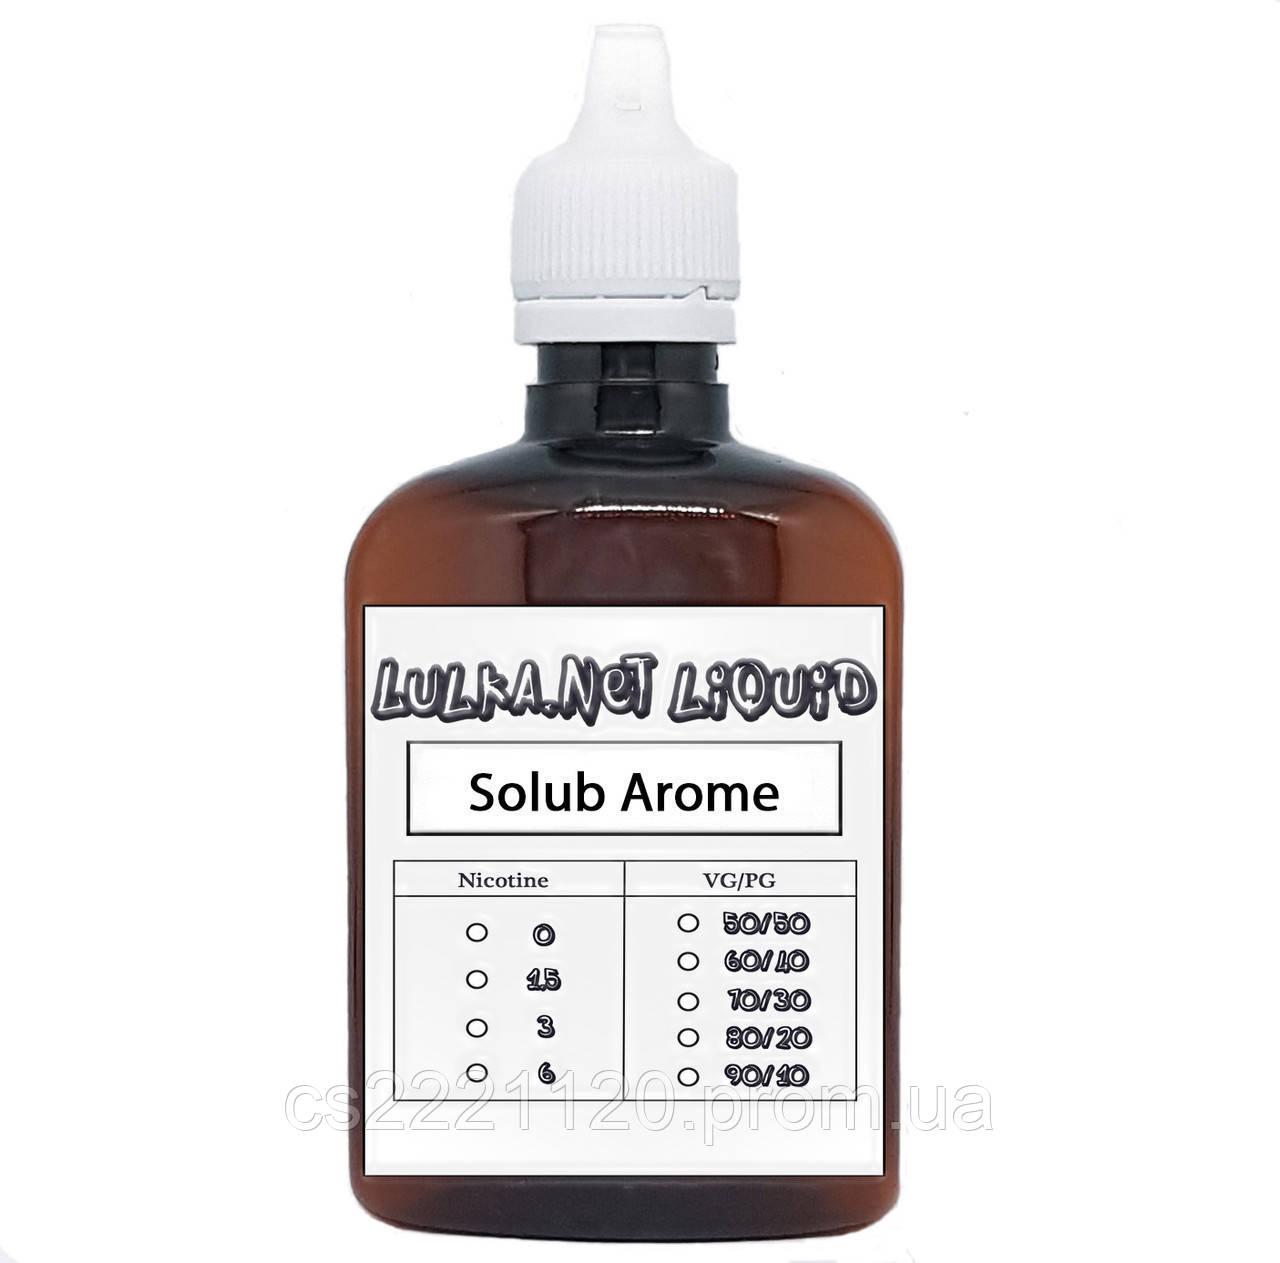 Жидкость Solubarome The Last (Печенье, клубника, сливки) 100 мл.